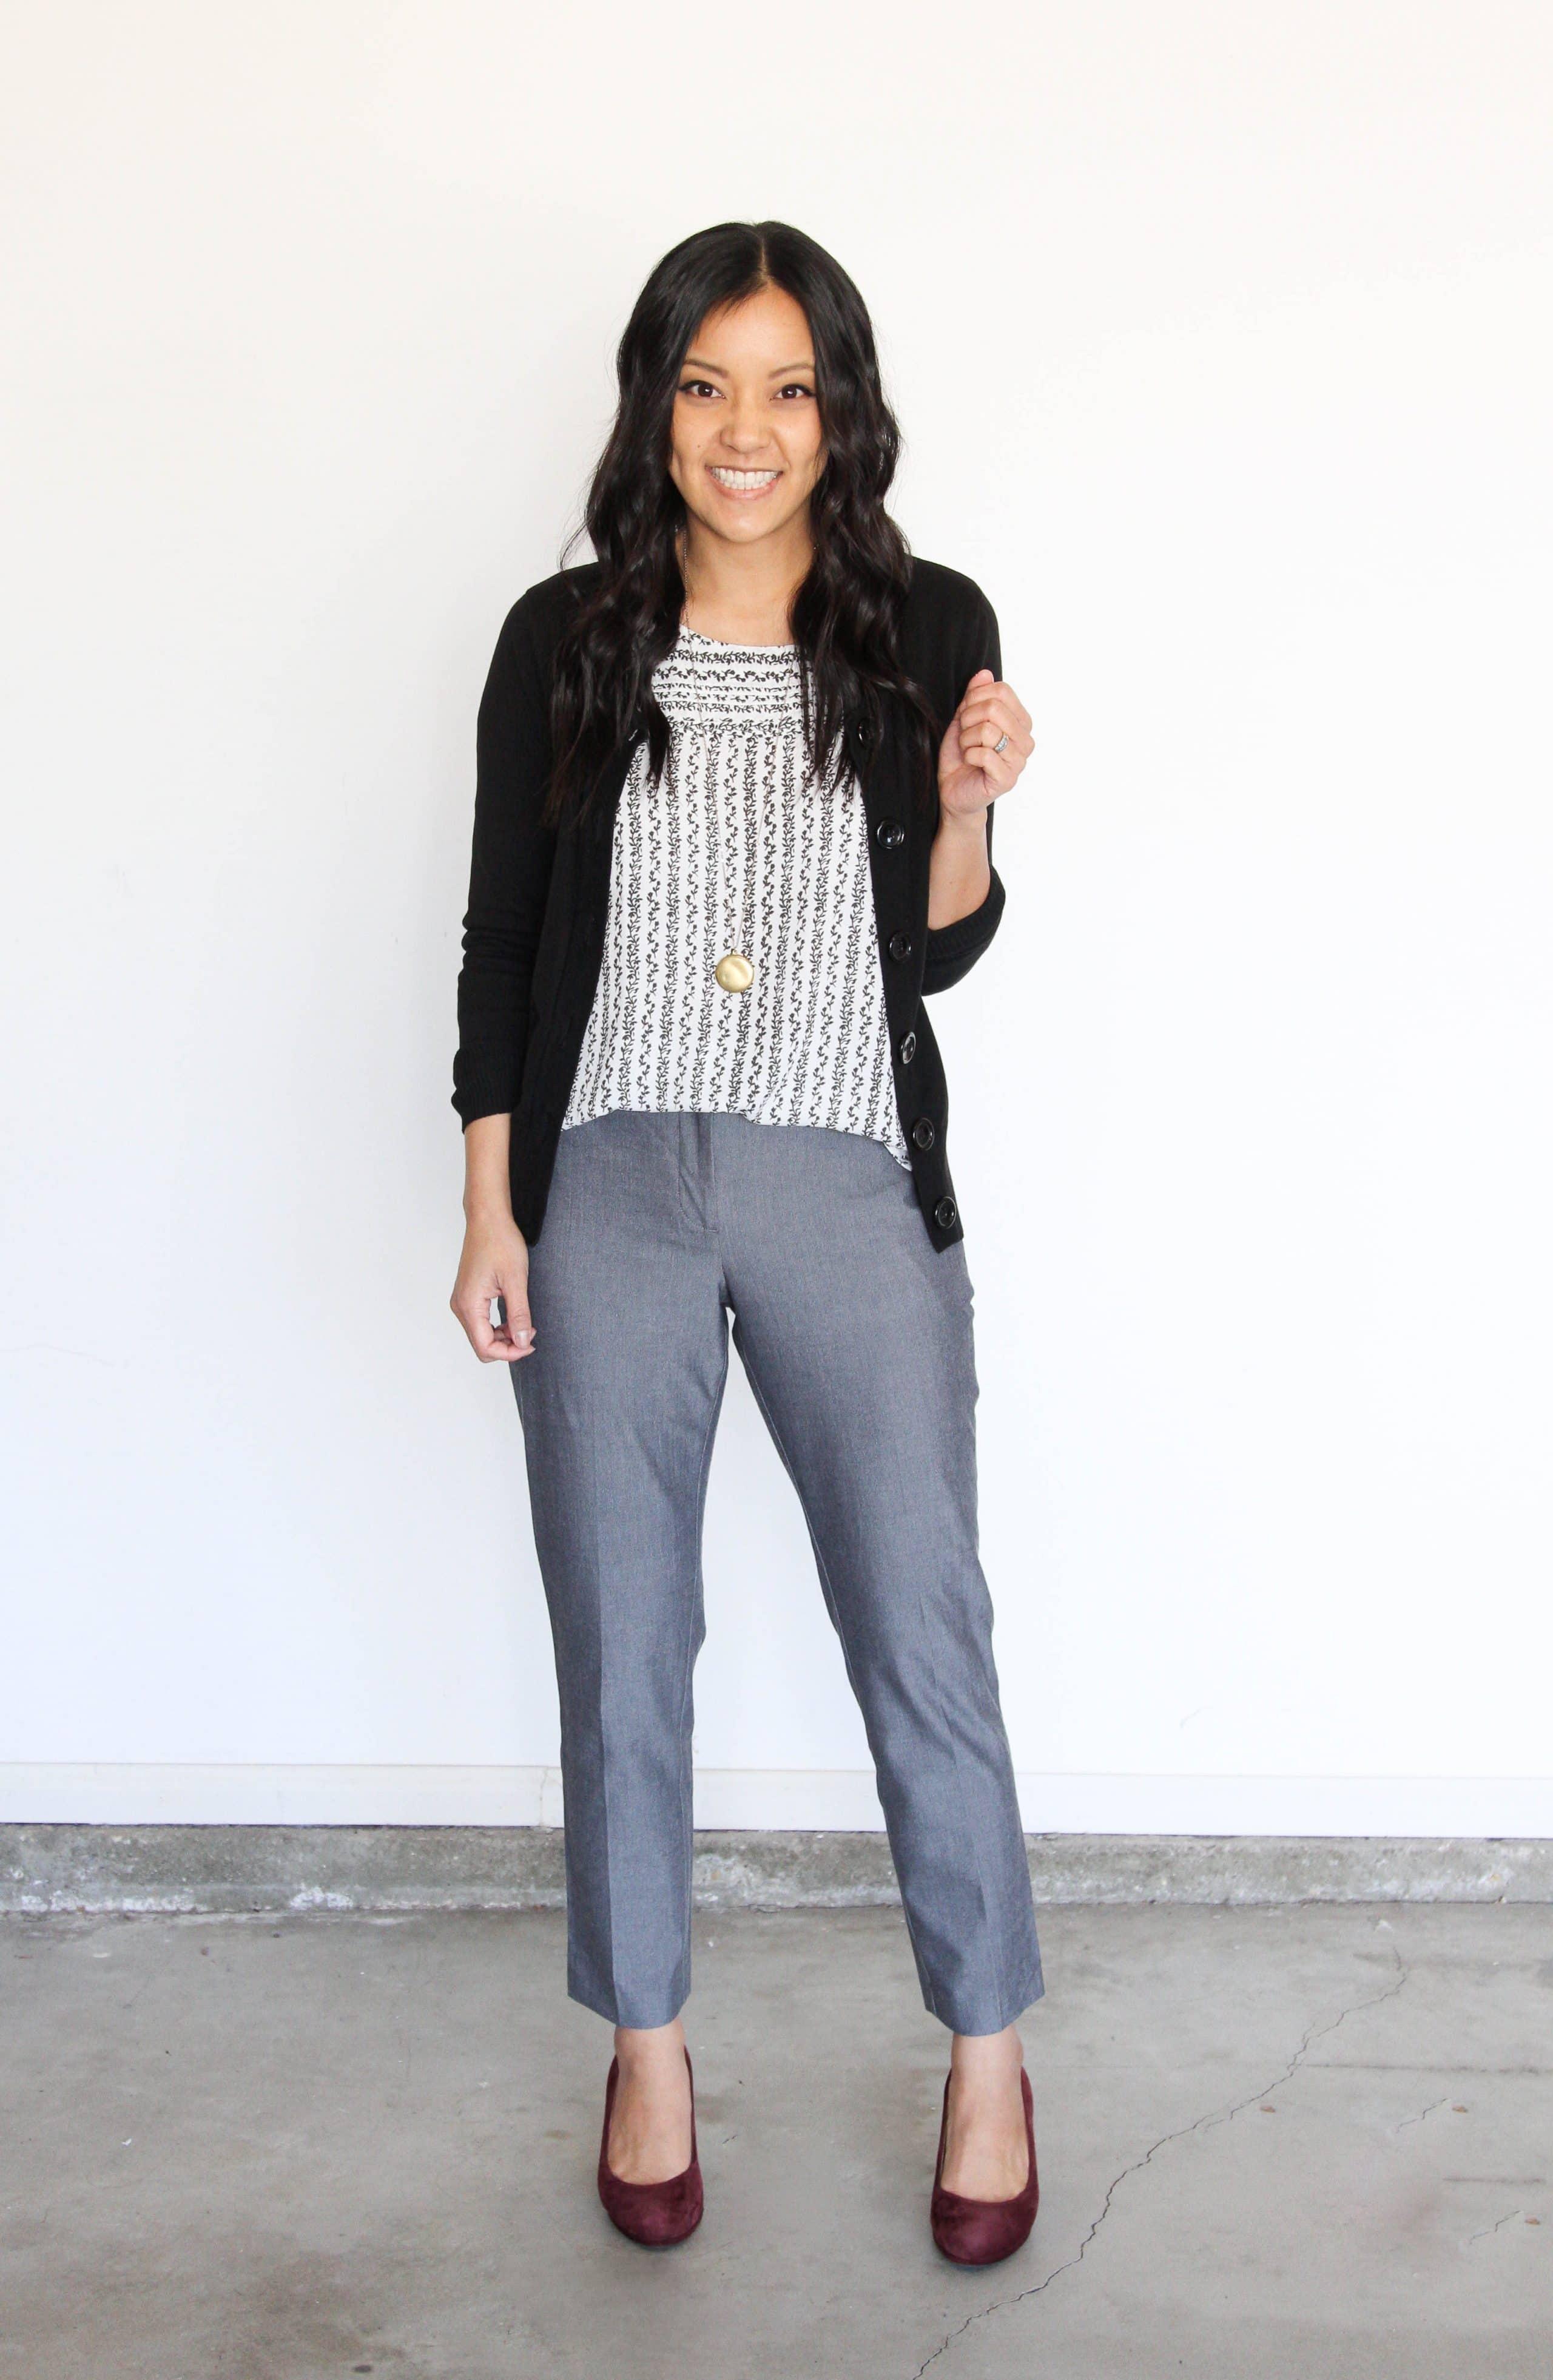 Business Casual: Printed Top + Black Cardigan + Grey Pants + Maroon Pants